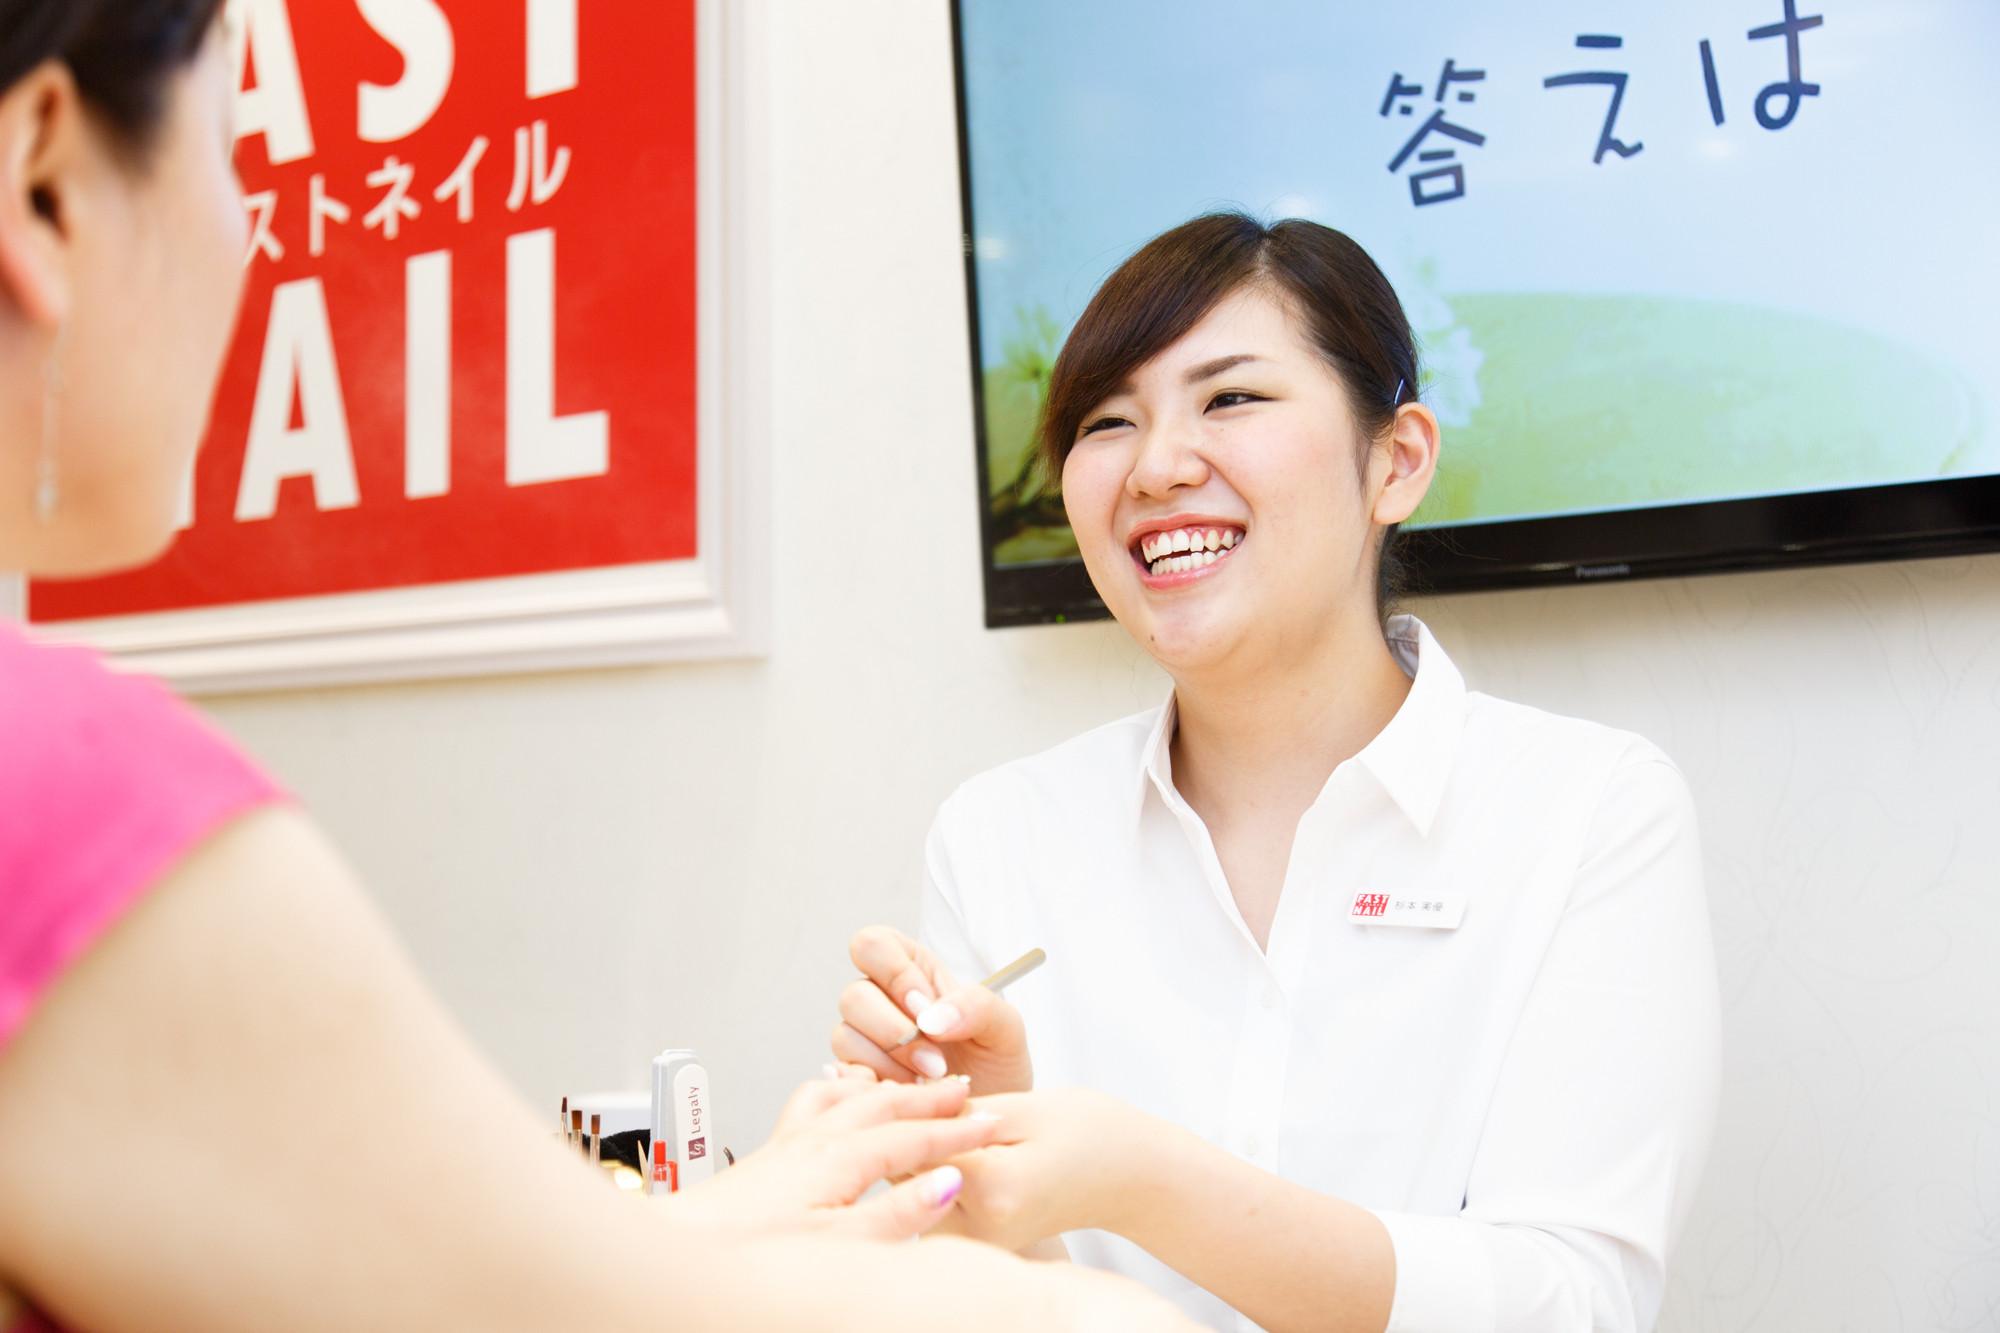 FASTNAIL(ファストネイル) 上野店 のアルバイト情報